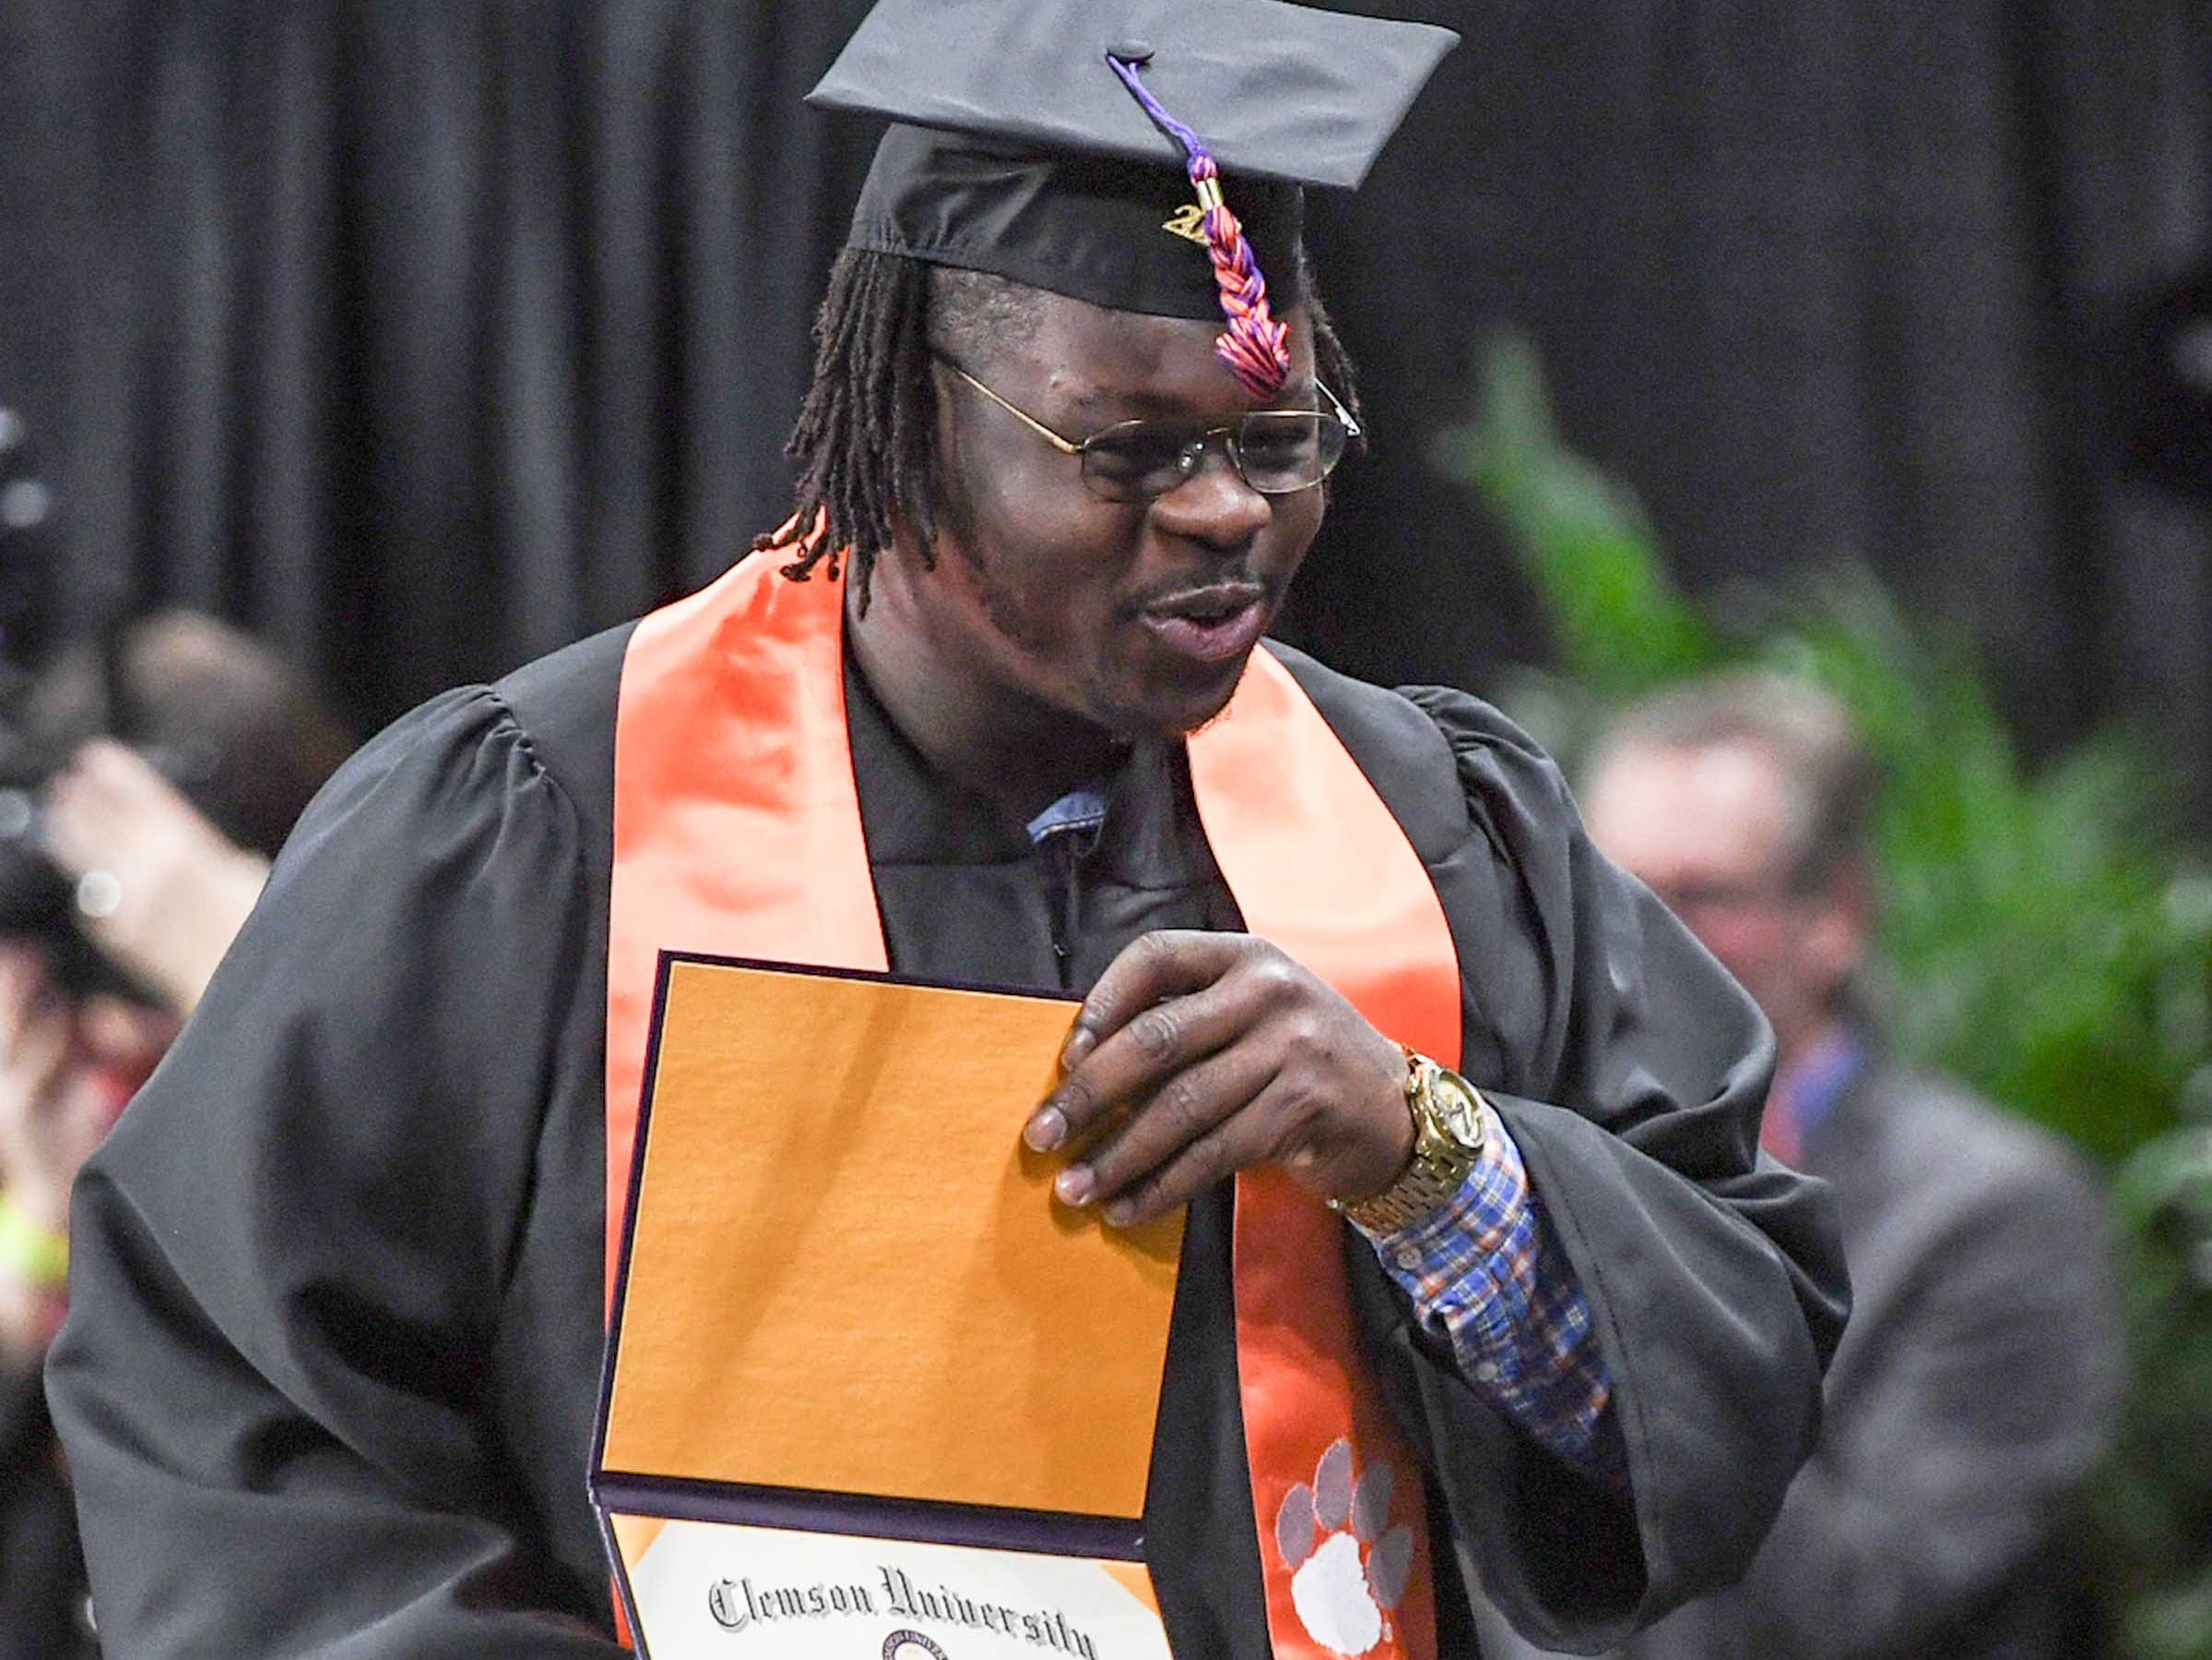 Clemson defensive lineman Albert Huggins shows his diploma during Clemson University graduation ceremony Thursday morning in Littlejohn Coliseum in Clemson.